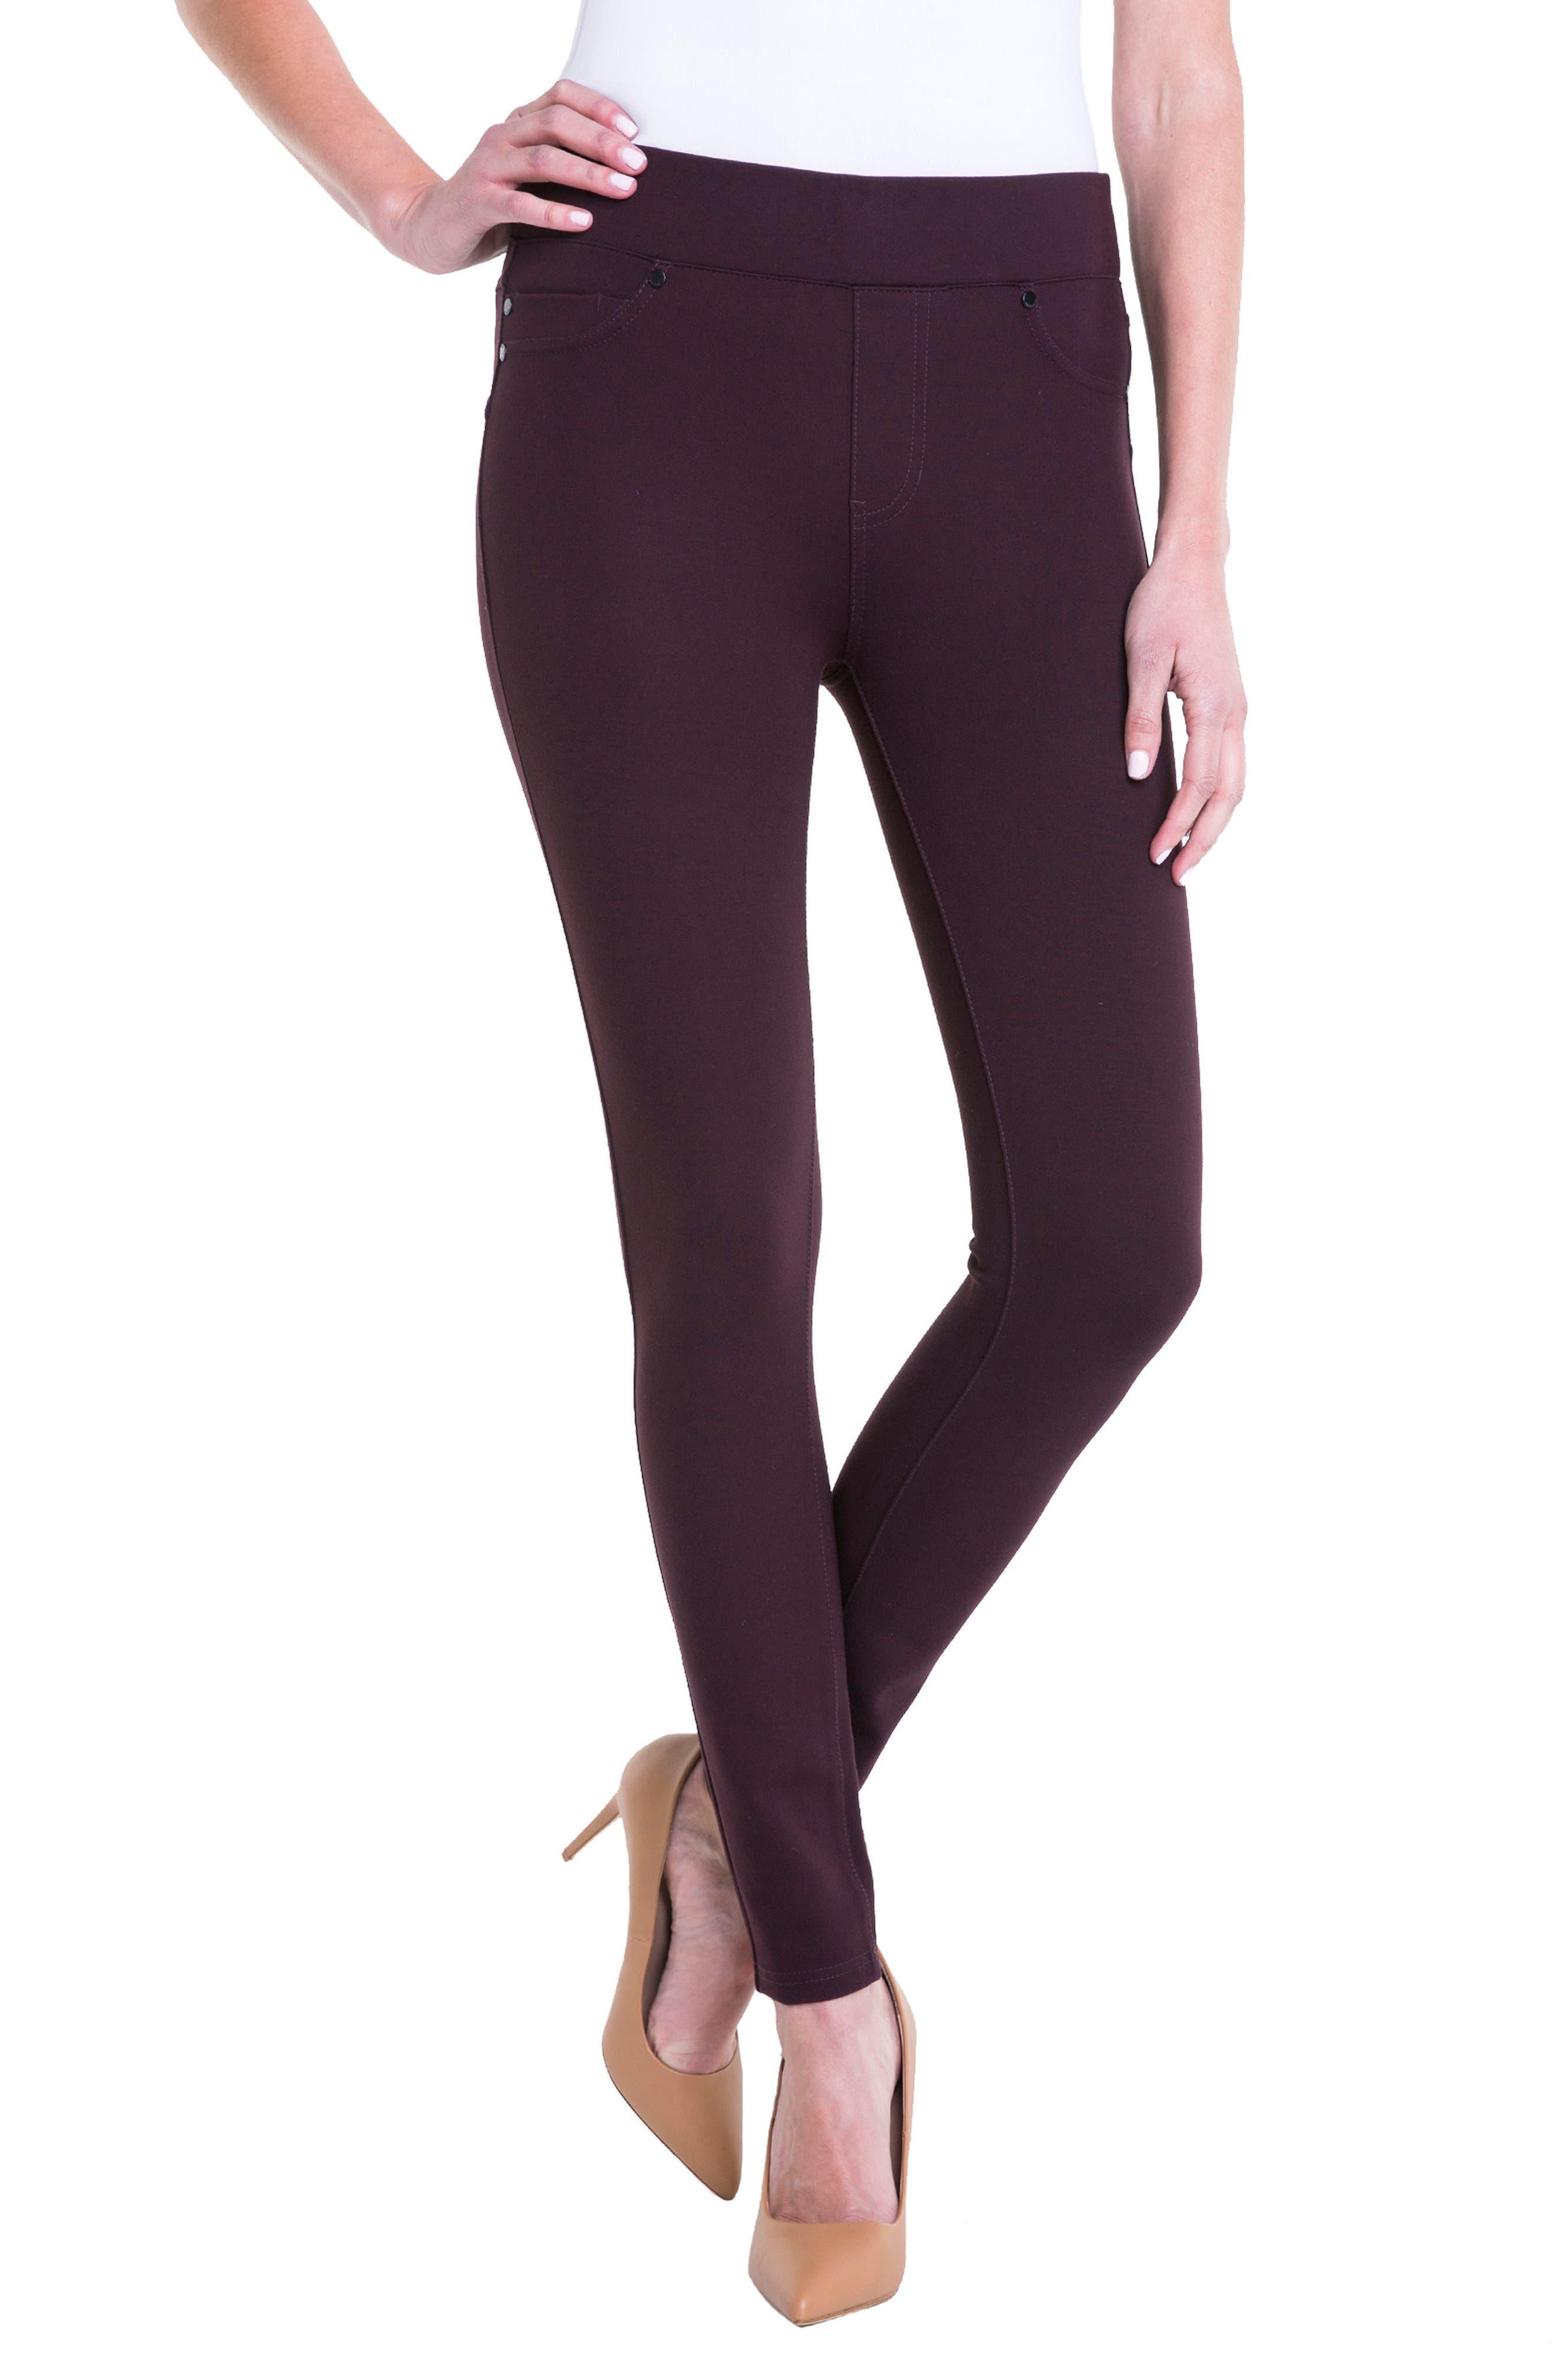 Alternate Image 3  - Liverpool Jeans Company Piper Hugger Leggings (Aubergine)